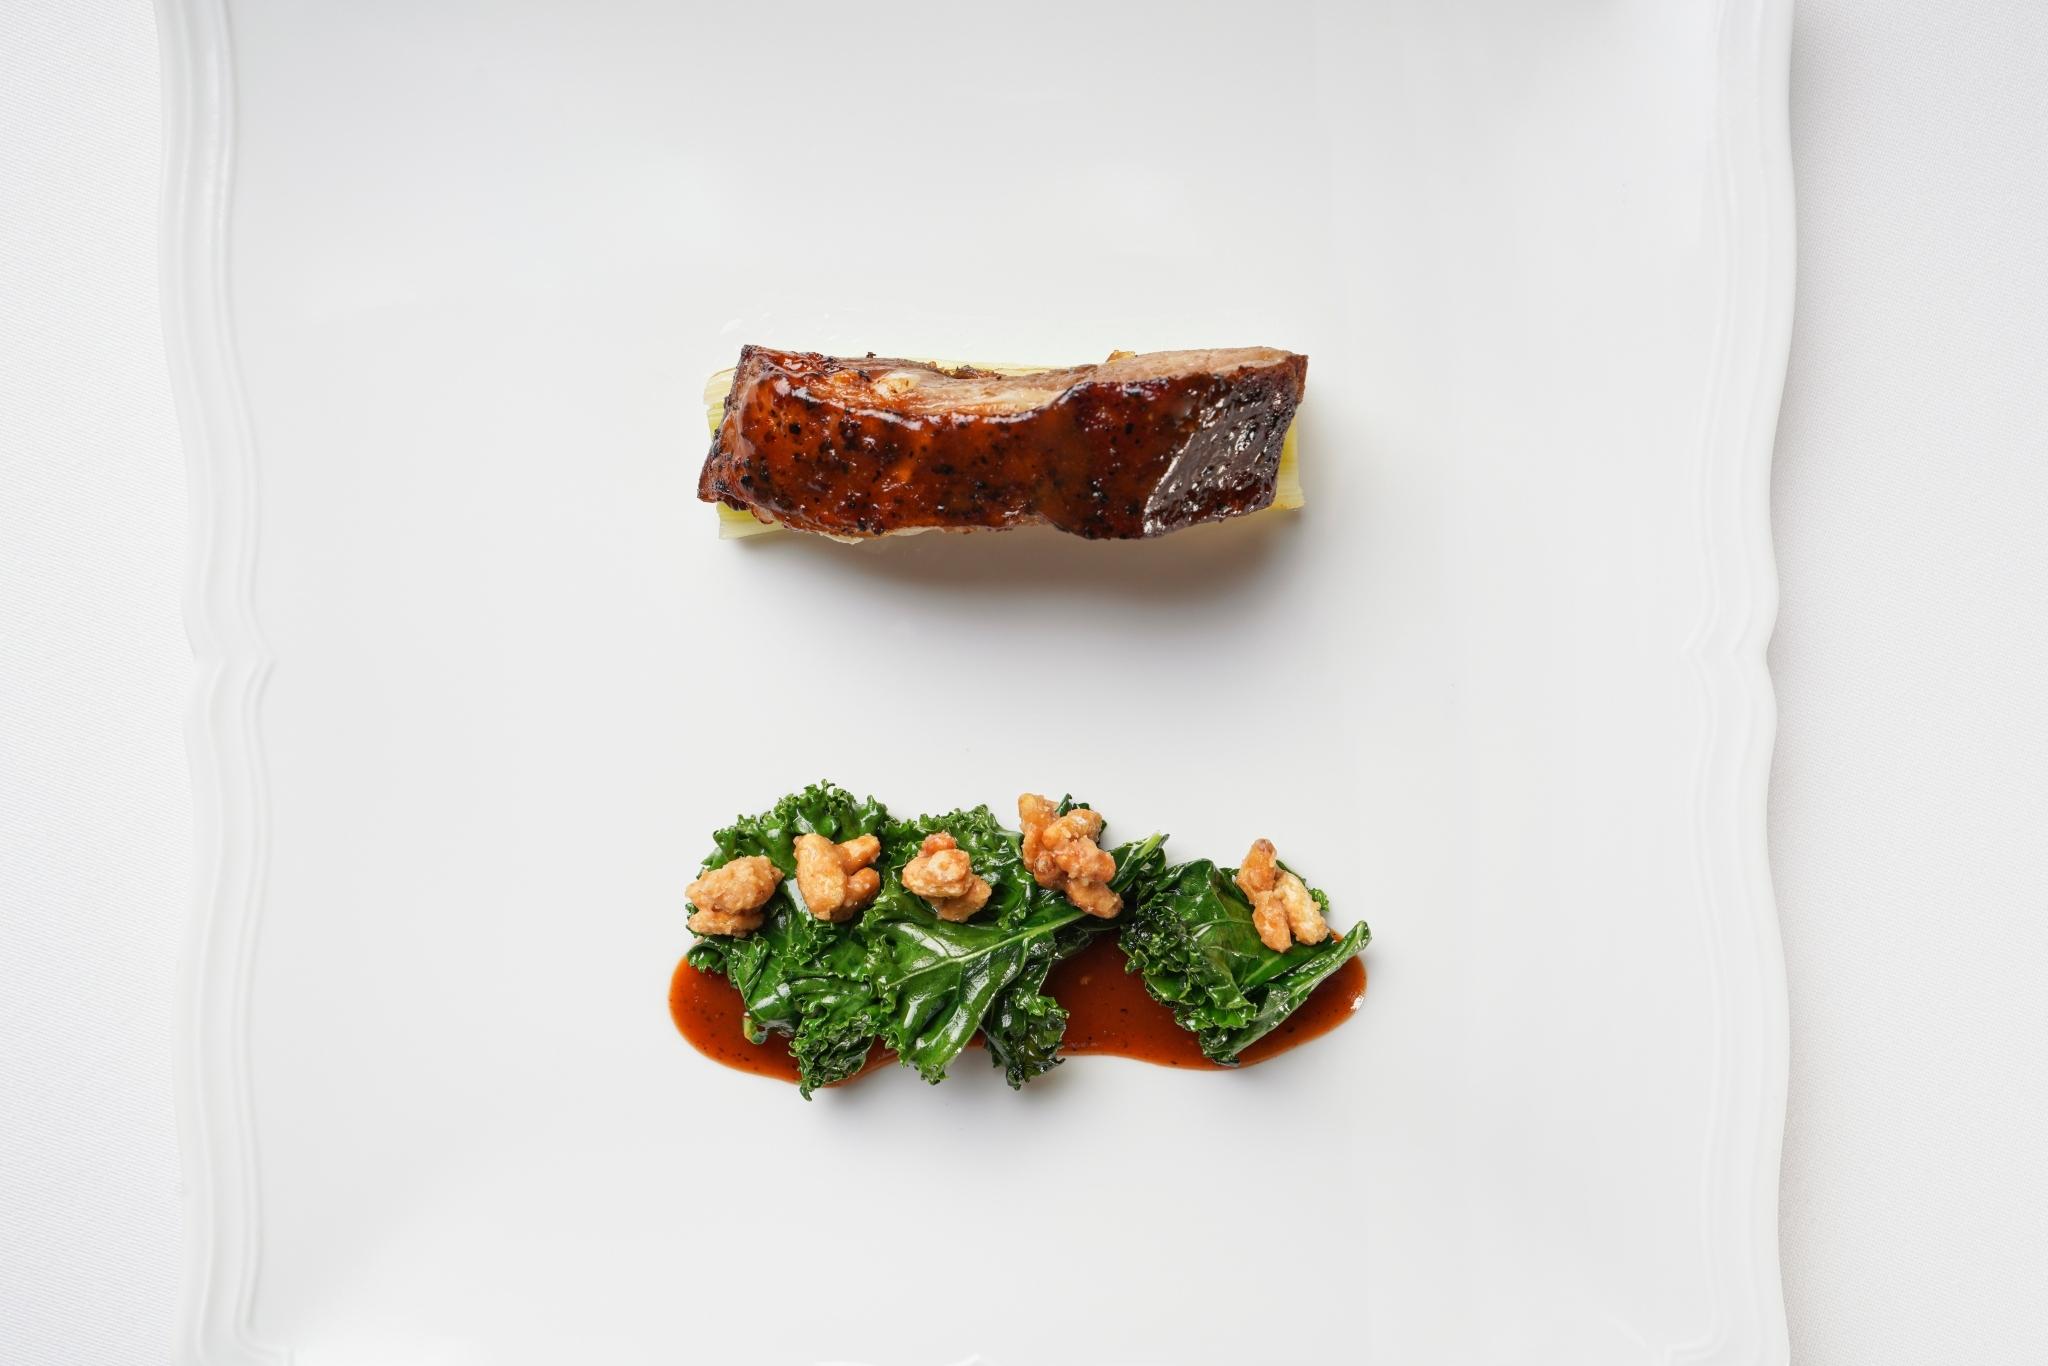 Castellana food